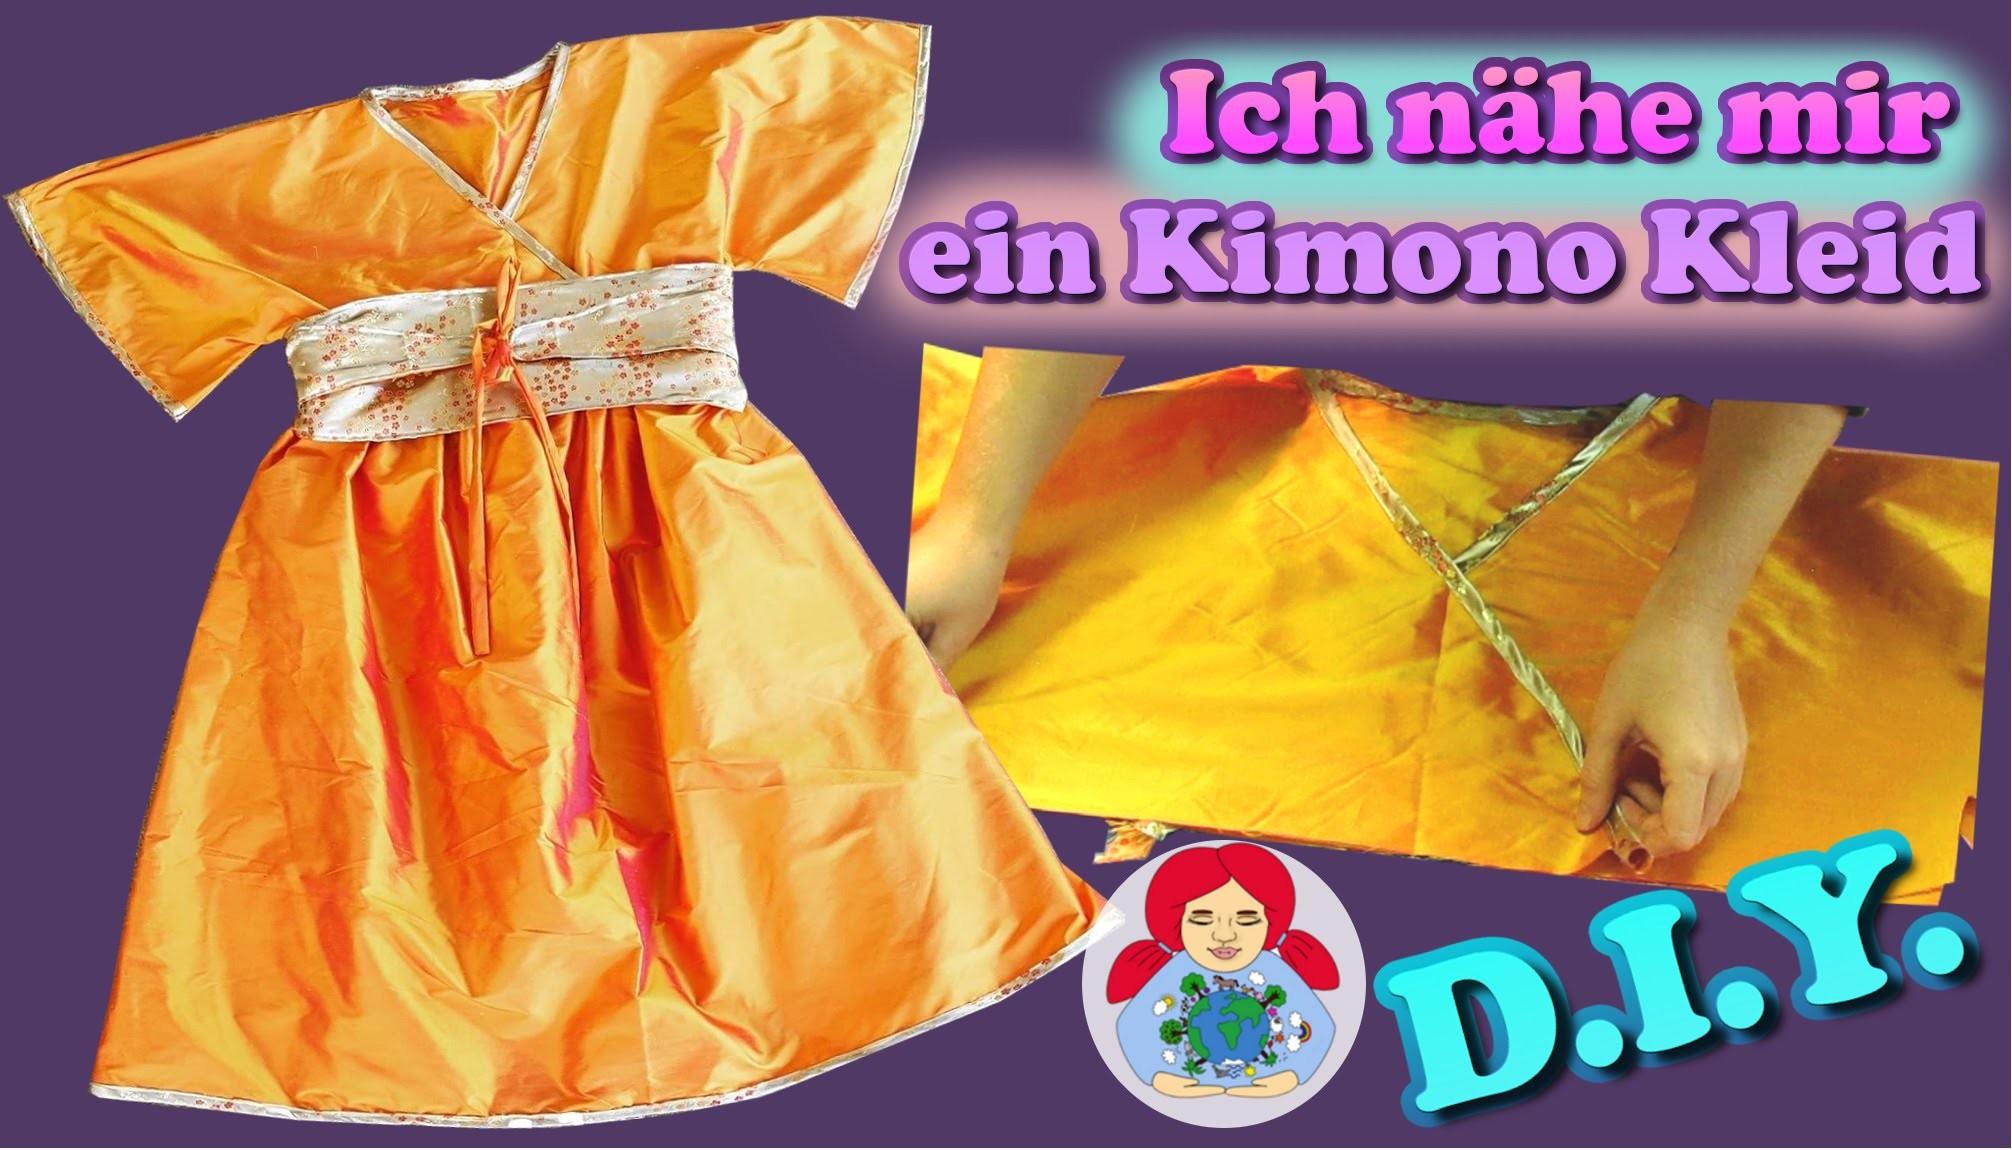 diy kimono kleid n hen schritt f r schritt damengr e. Black Bedroom Furniture Sets. Home Design Ideas